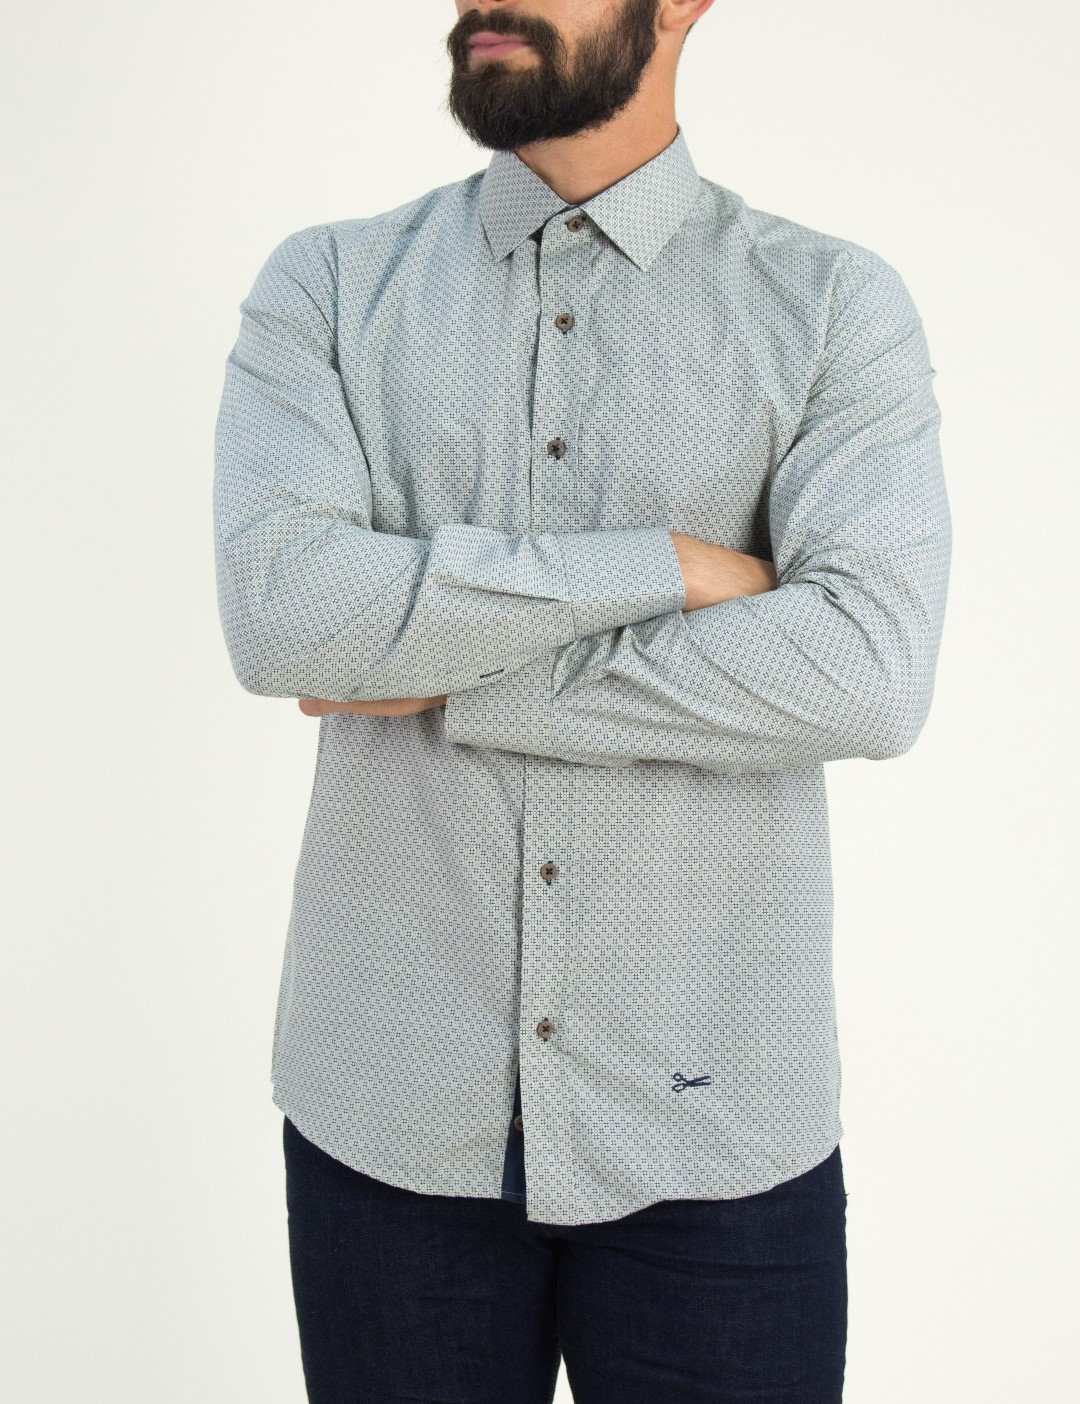 6194c3bb62ad Ανδρικό μπεζ πουκάμισο με μπλε γεωμετρικά σχέδια Ben Tailor 0084